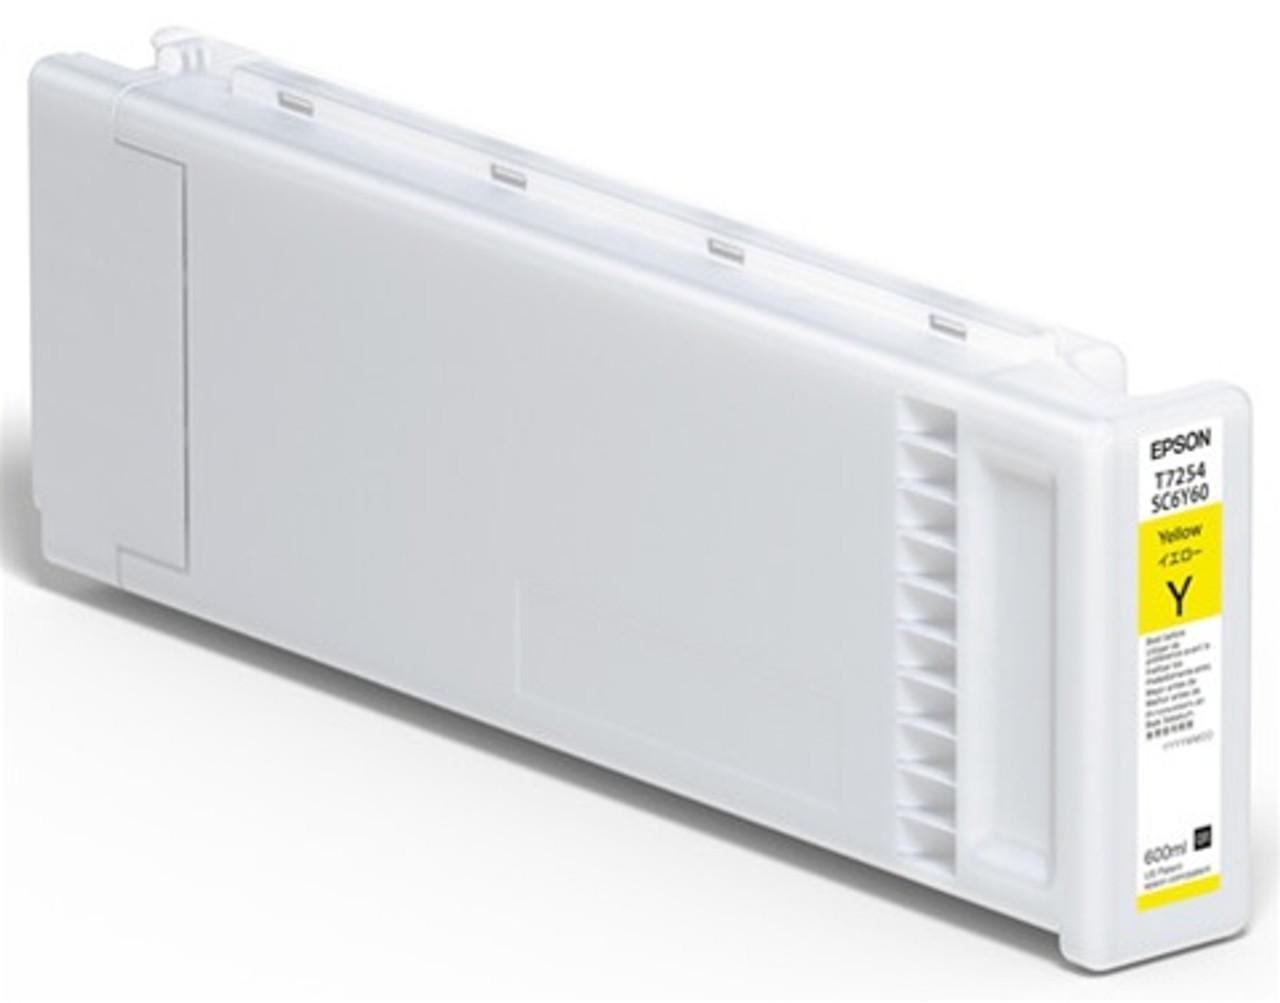 Epson F2100/F2000 Ink Cartridge, YELLOW 600ML